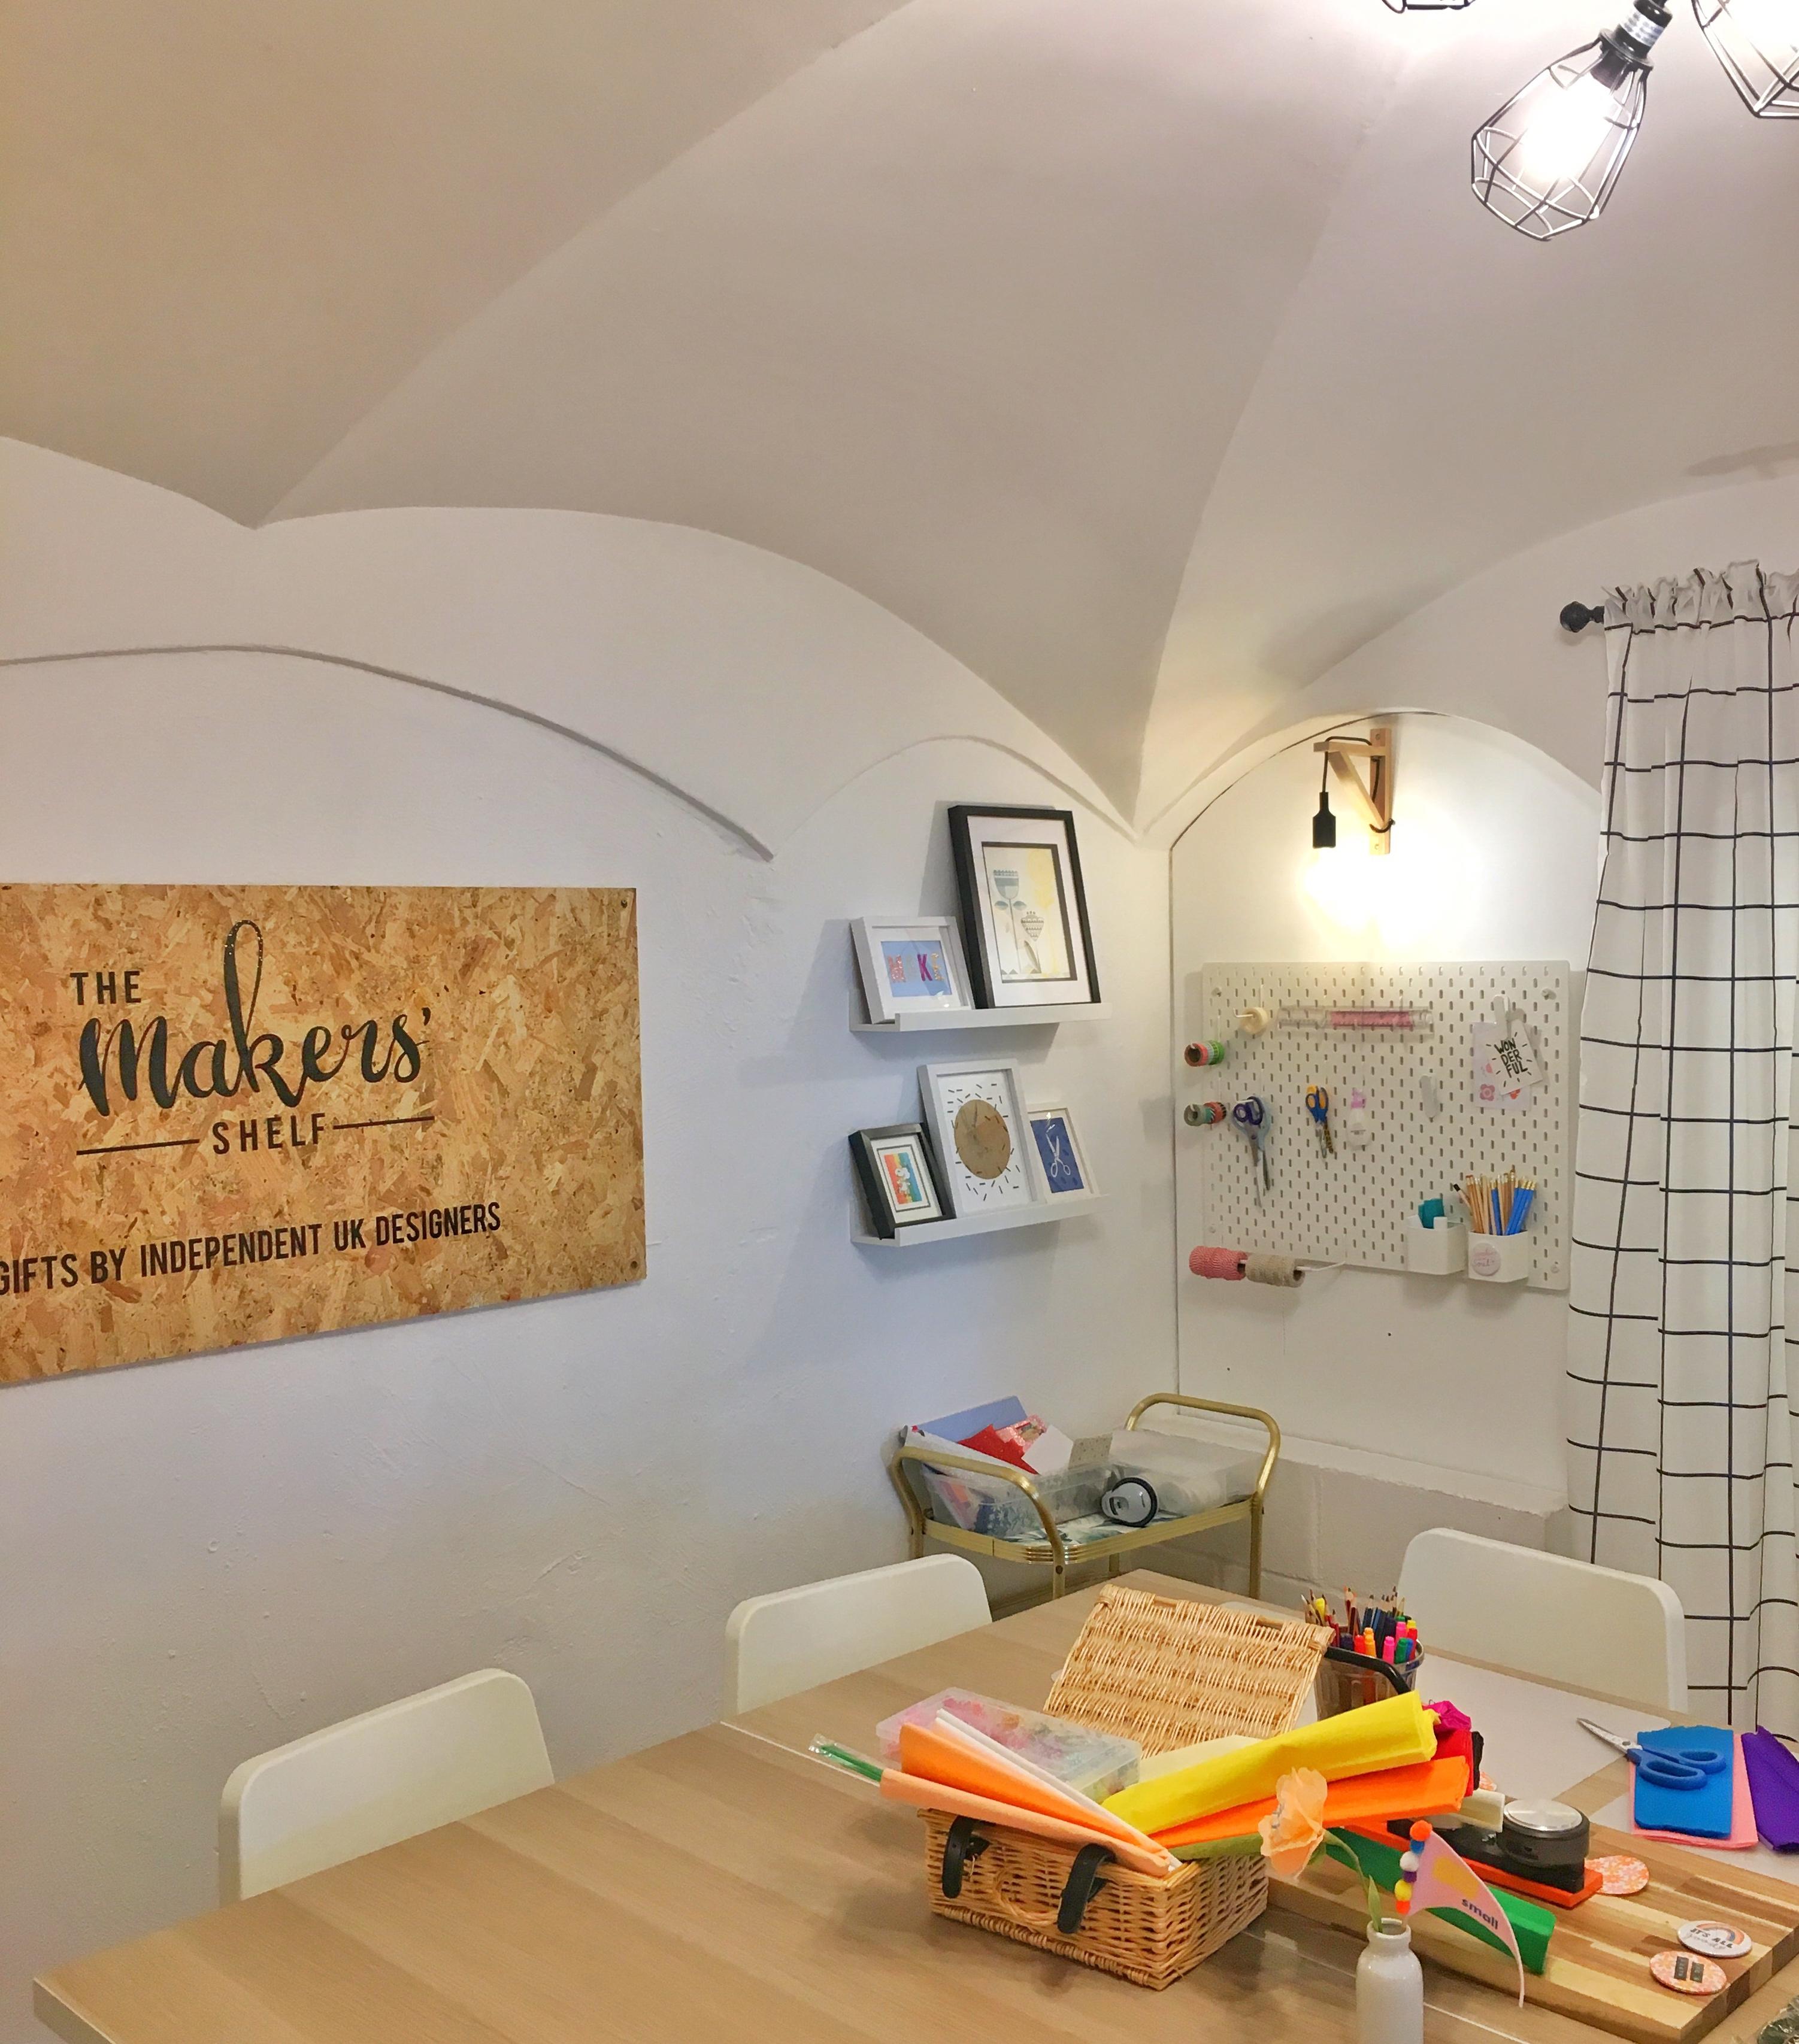 The Makers' Shelf, Newmarket